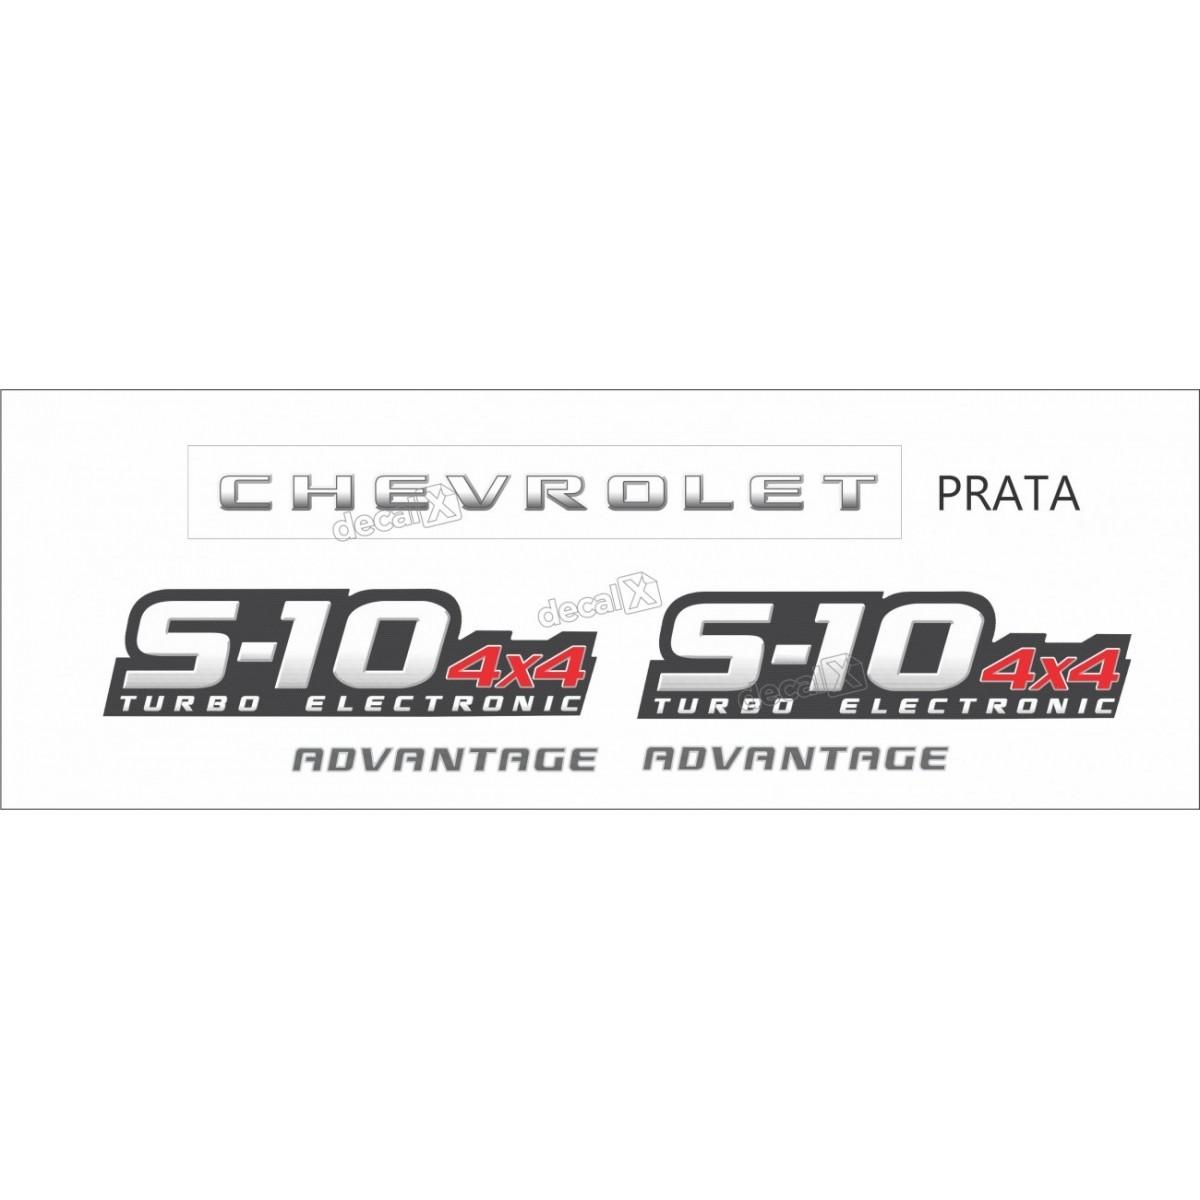 Faixa Adesivo Chevrolet S10 Advantage 4x4 2009 A 2011 Prata